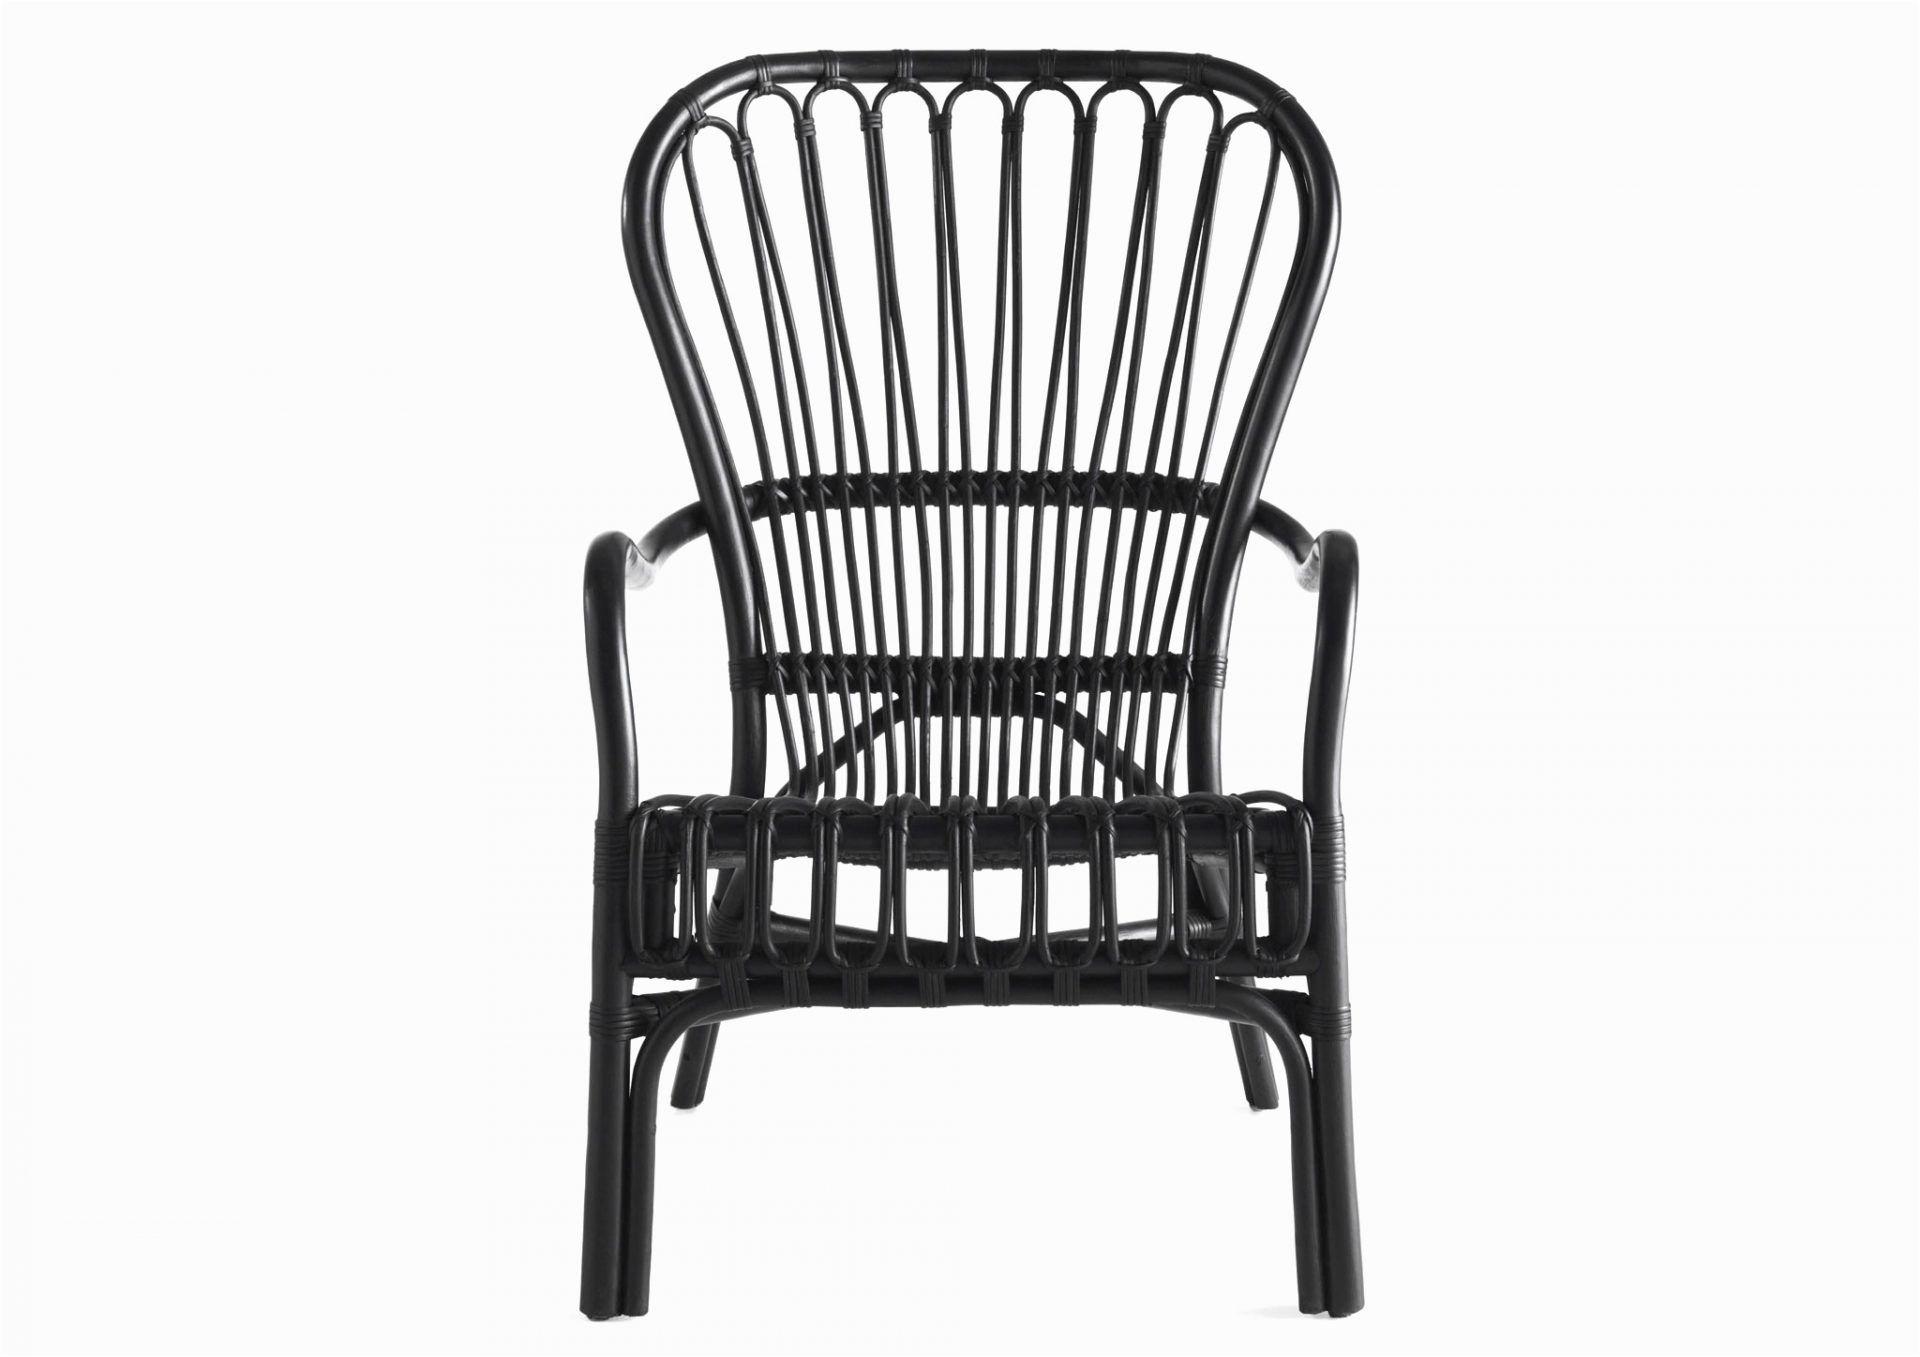 Rattan Meditation Chair Ikea Chair Stunning New Ikea Rattan Chair Photos Home Improvement